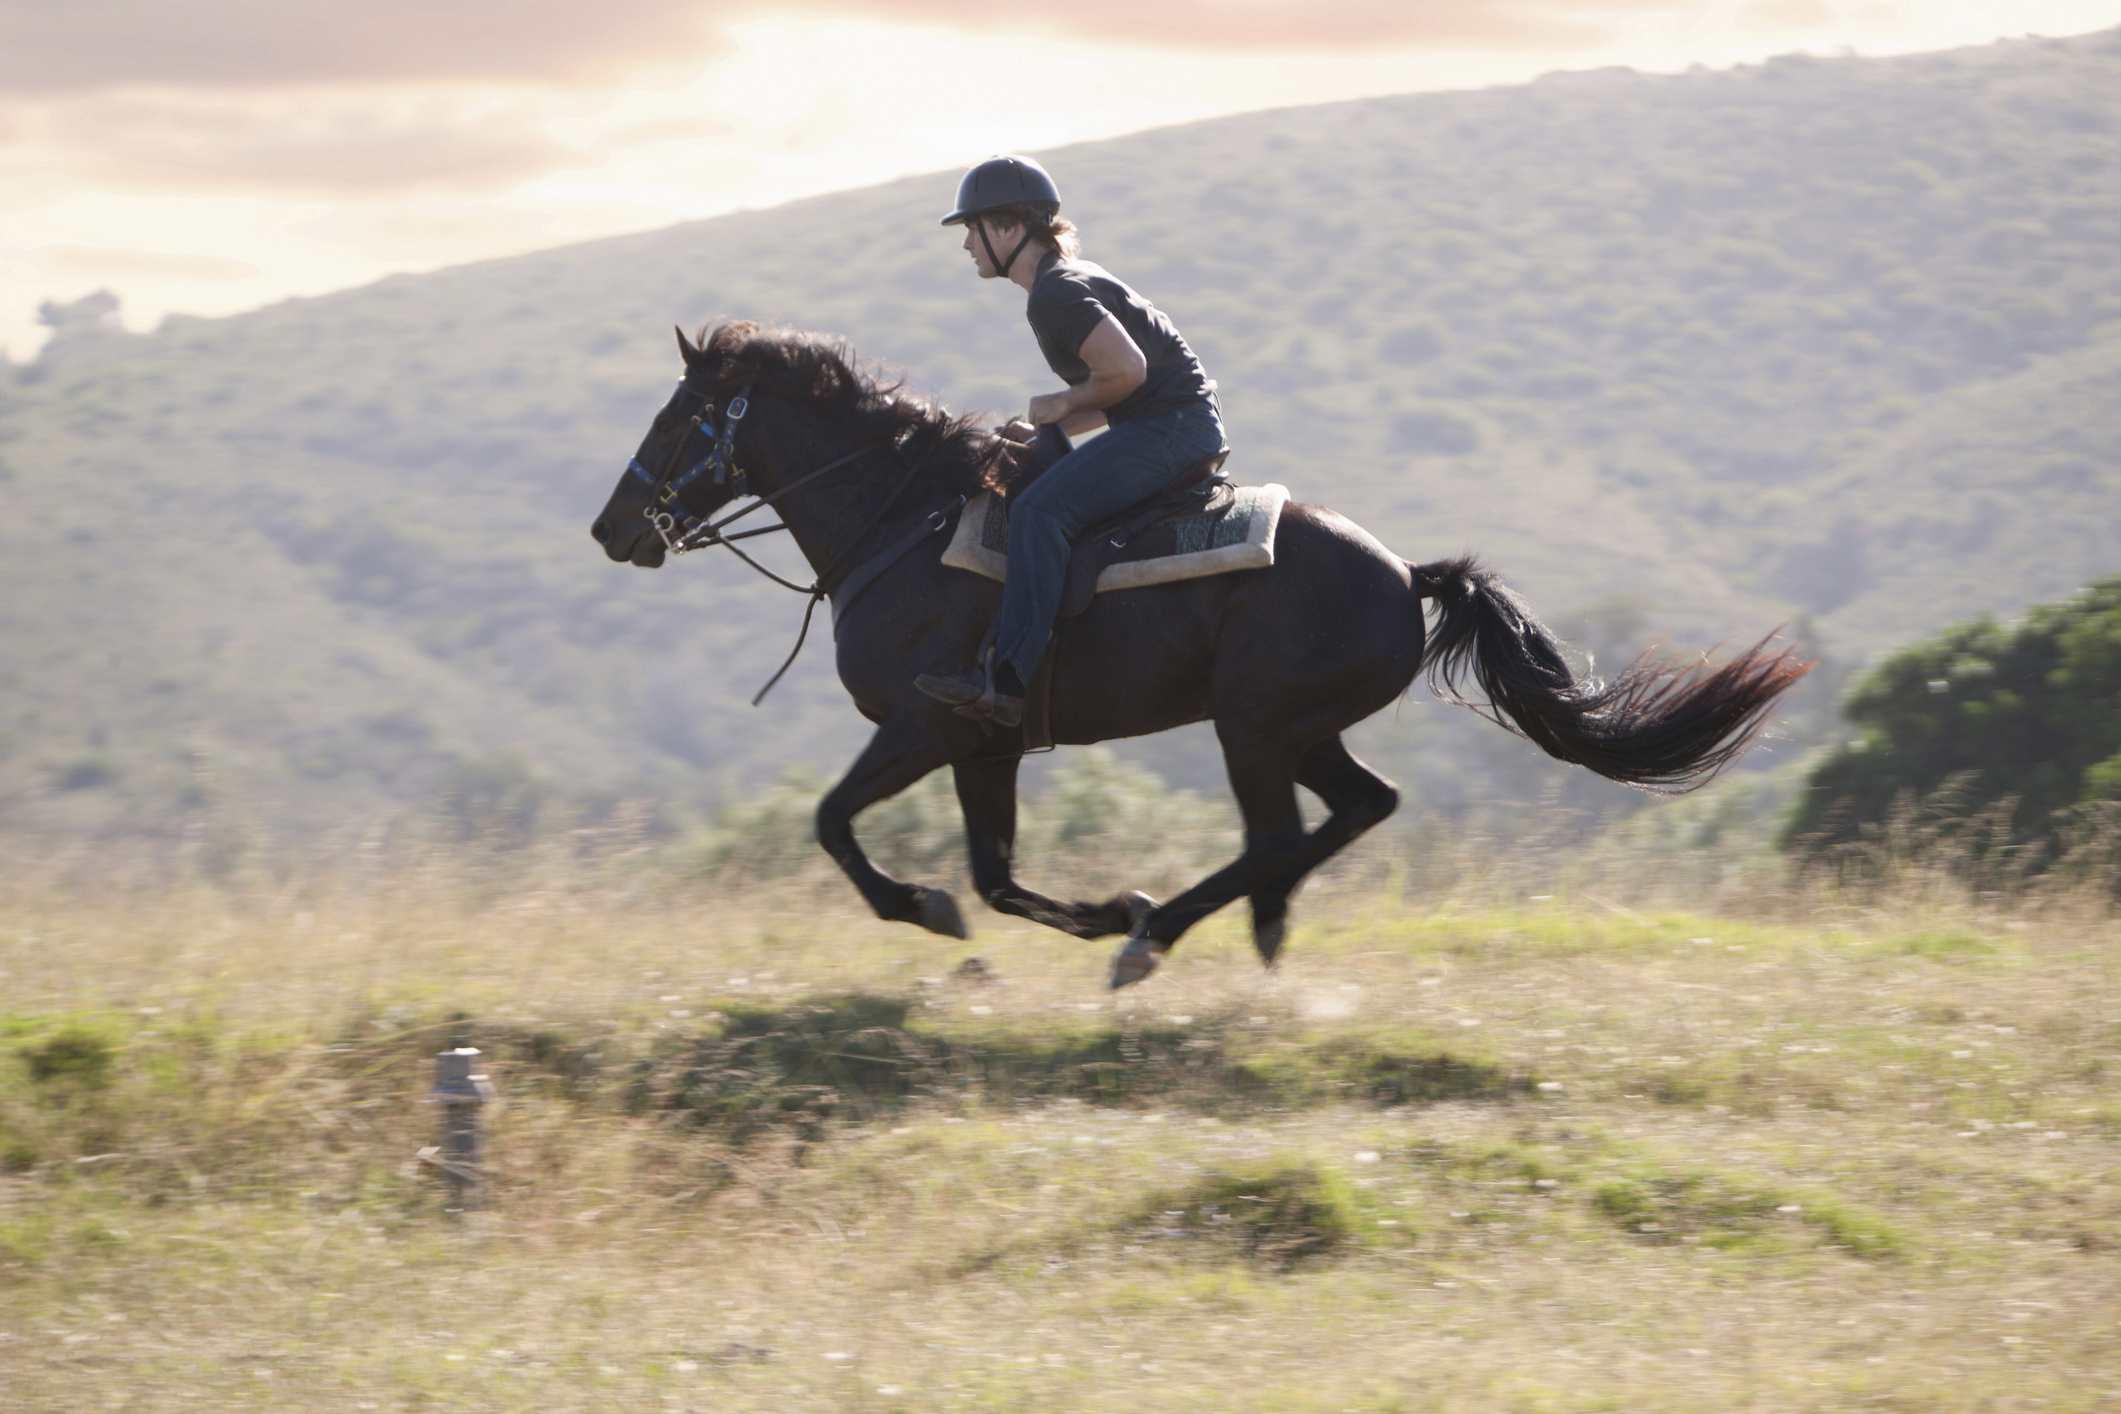 Man riding horse leaning forward